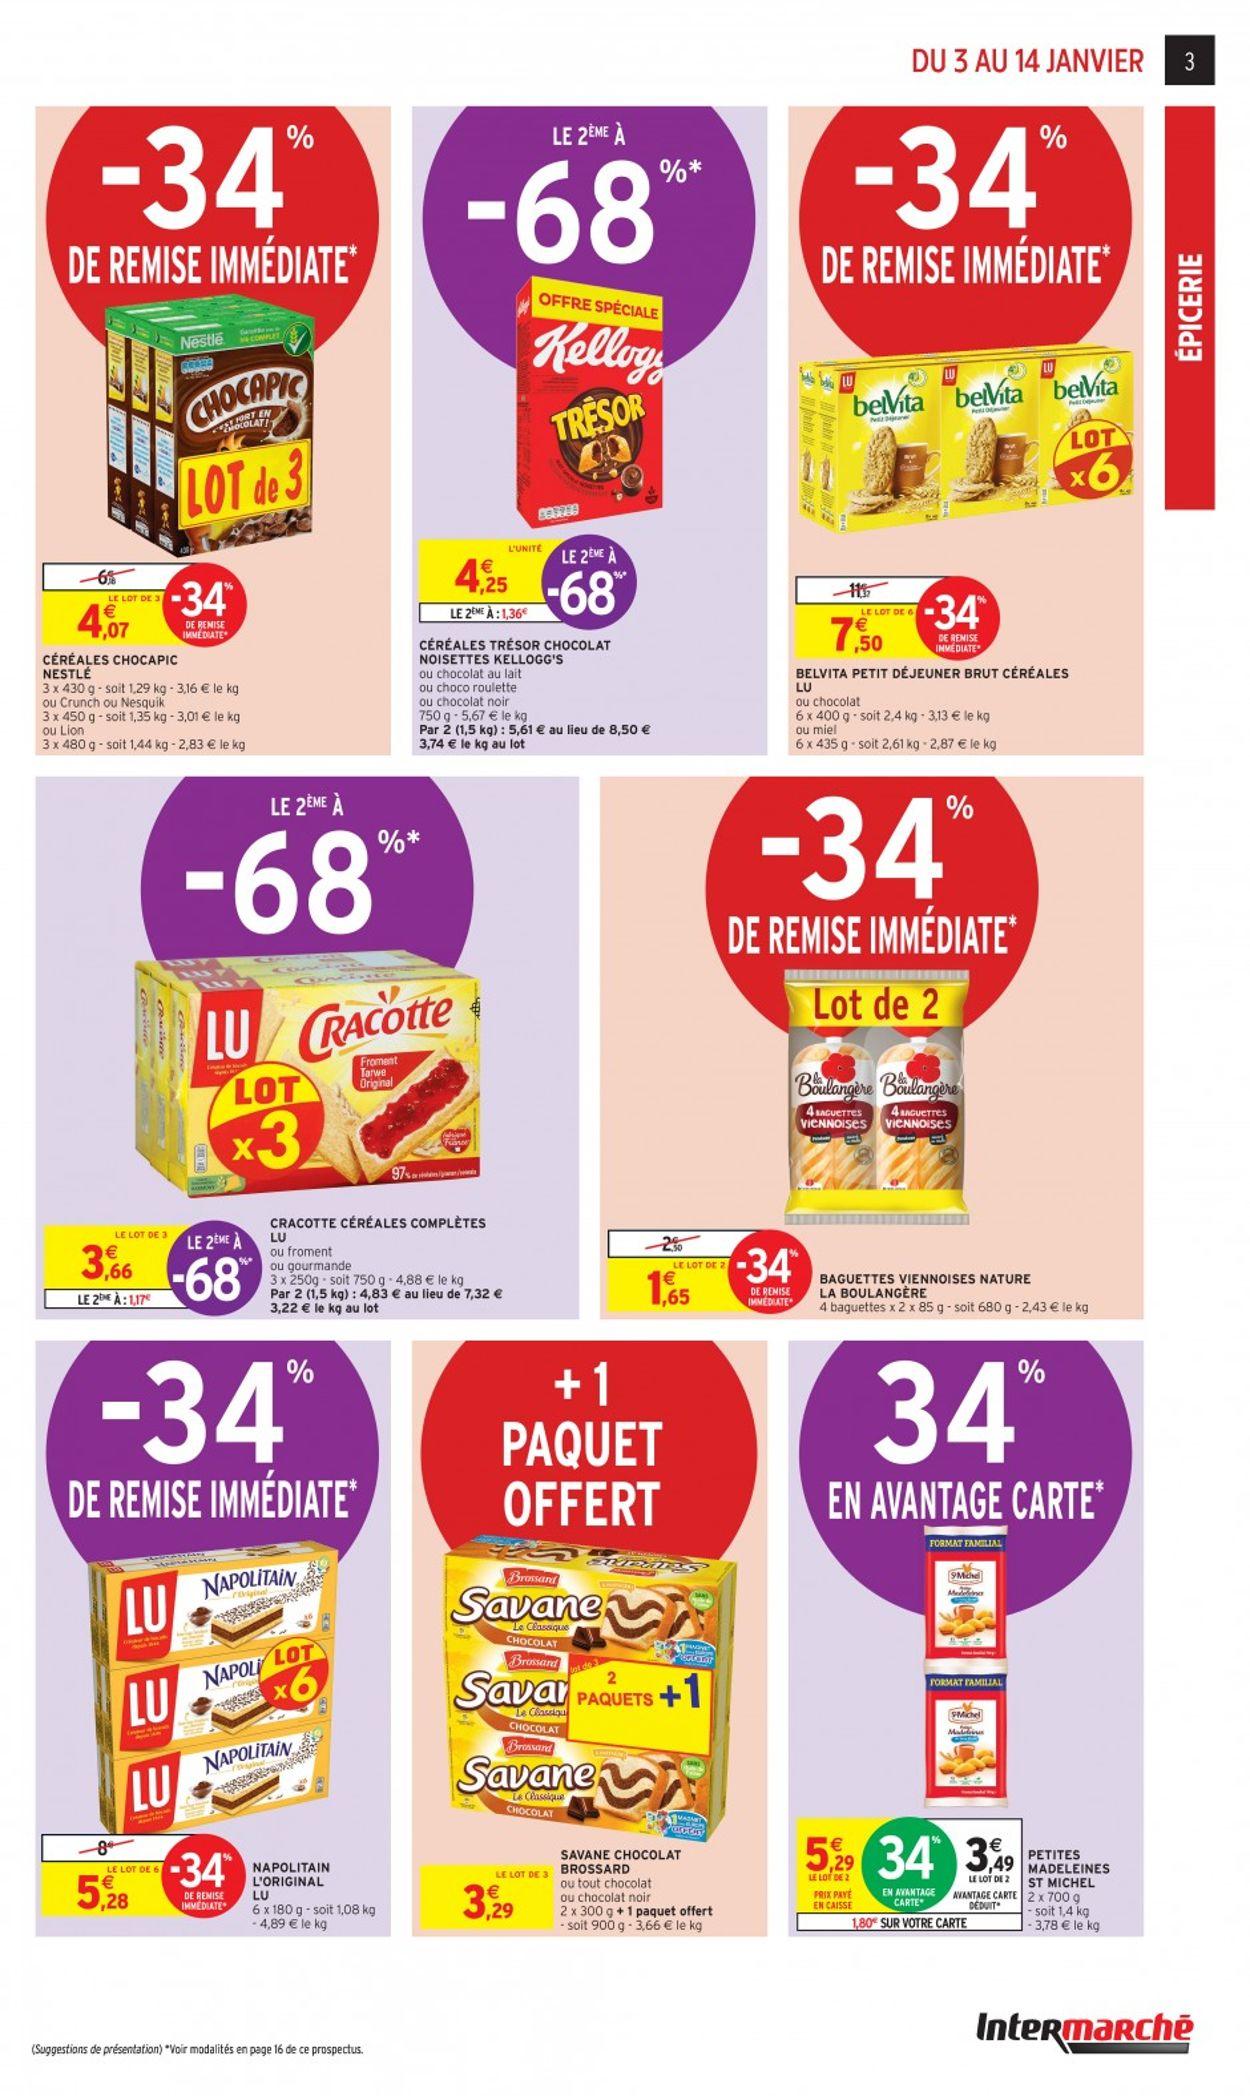 Intermarché Catalogue - 03.01-14.01.2020 (Page 3)